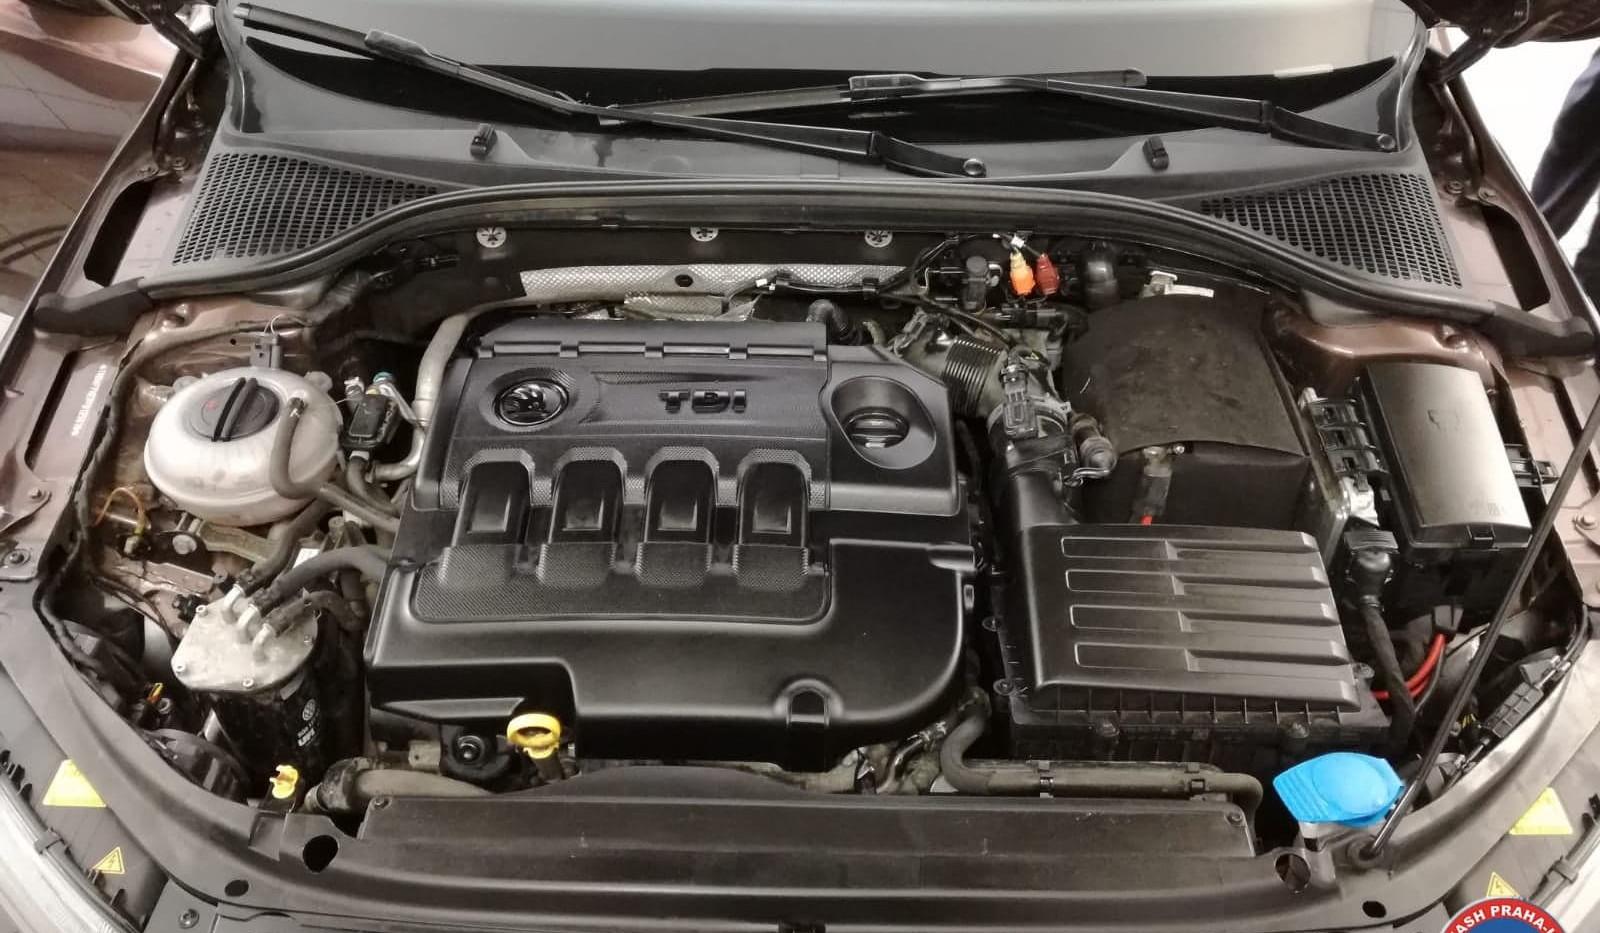 Car Wash - Cisteni motoru (6).jpg